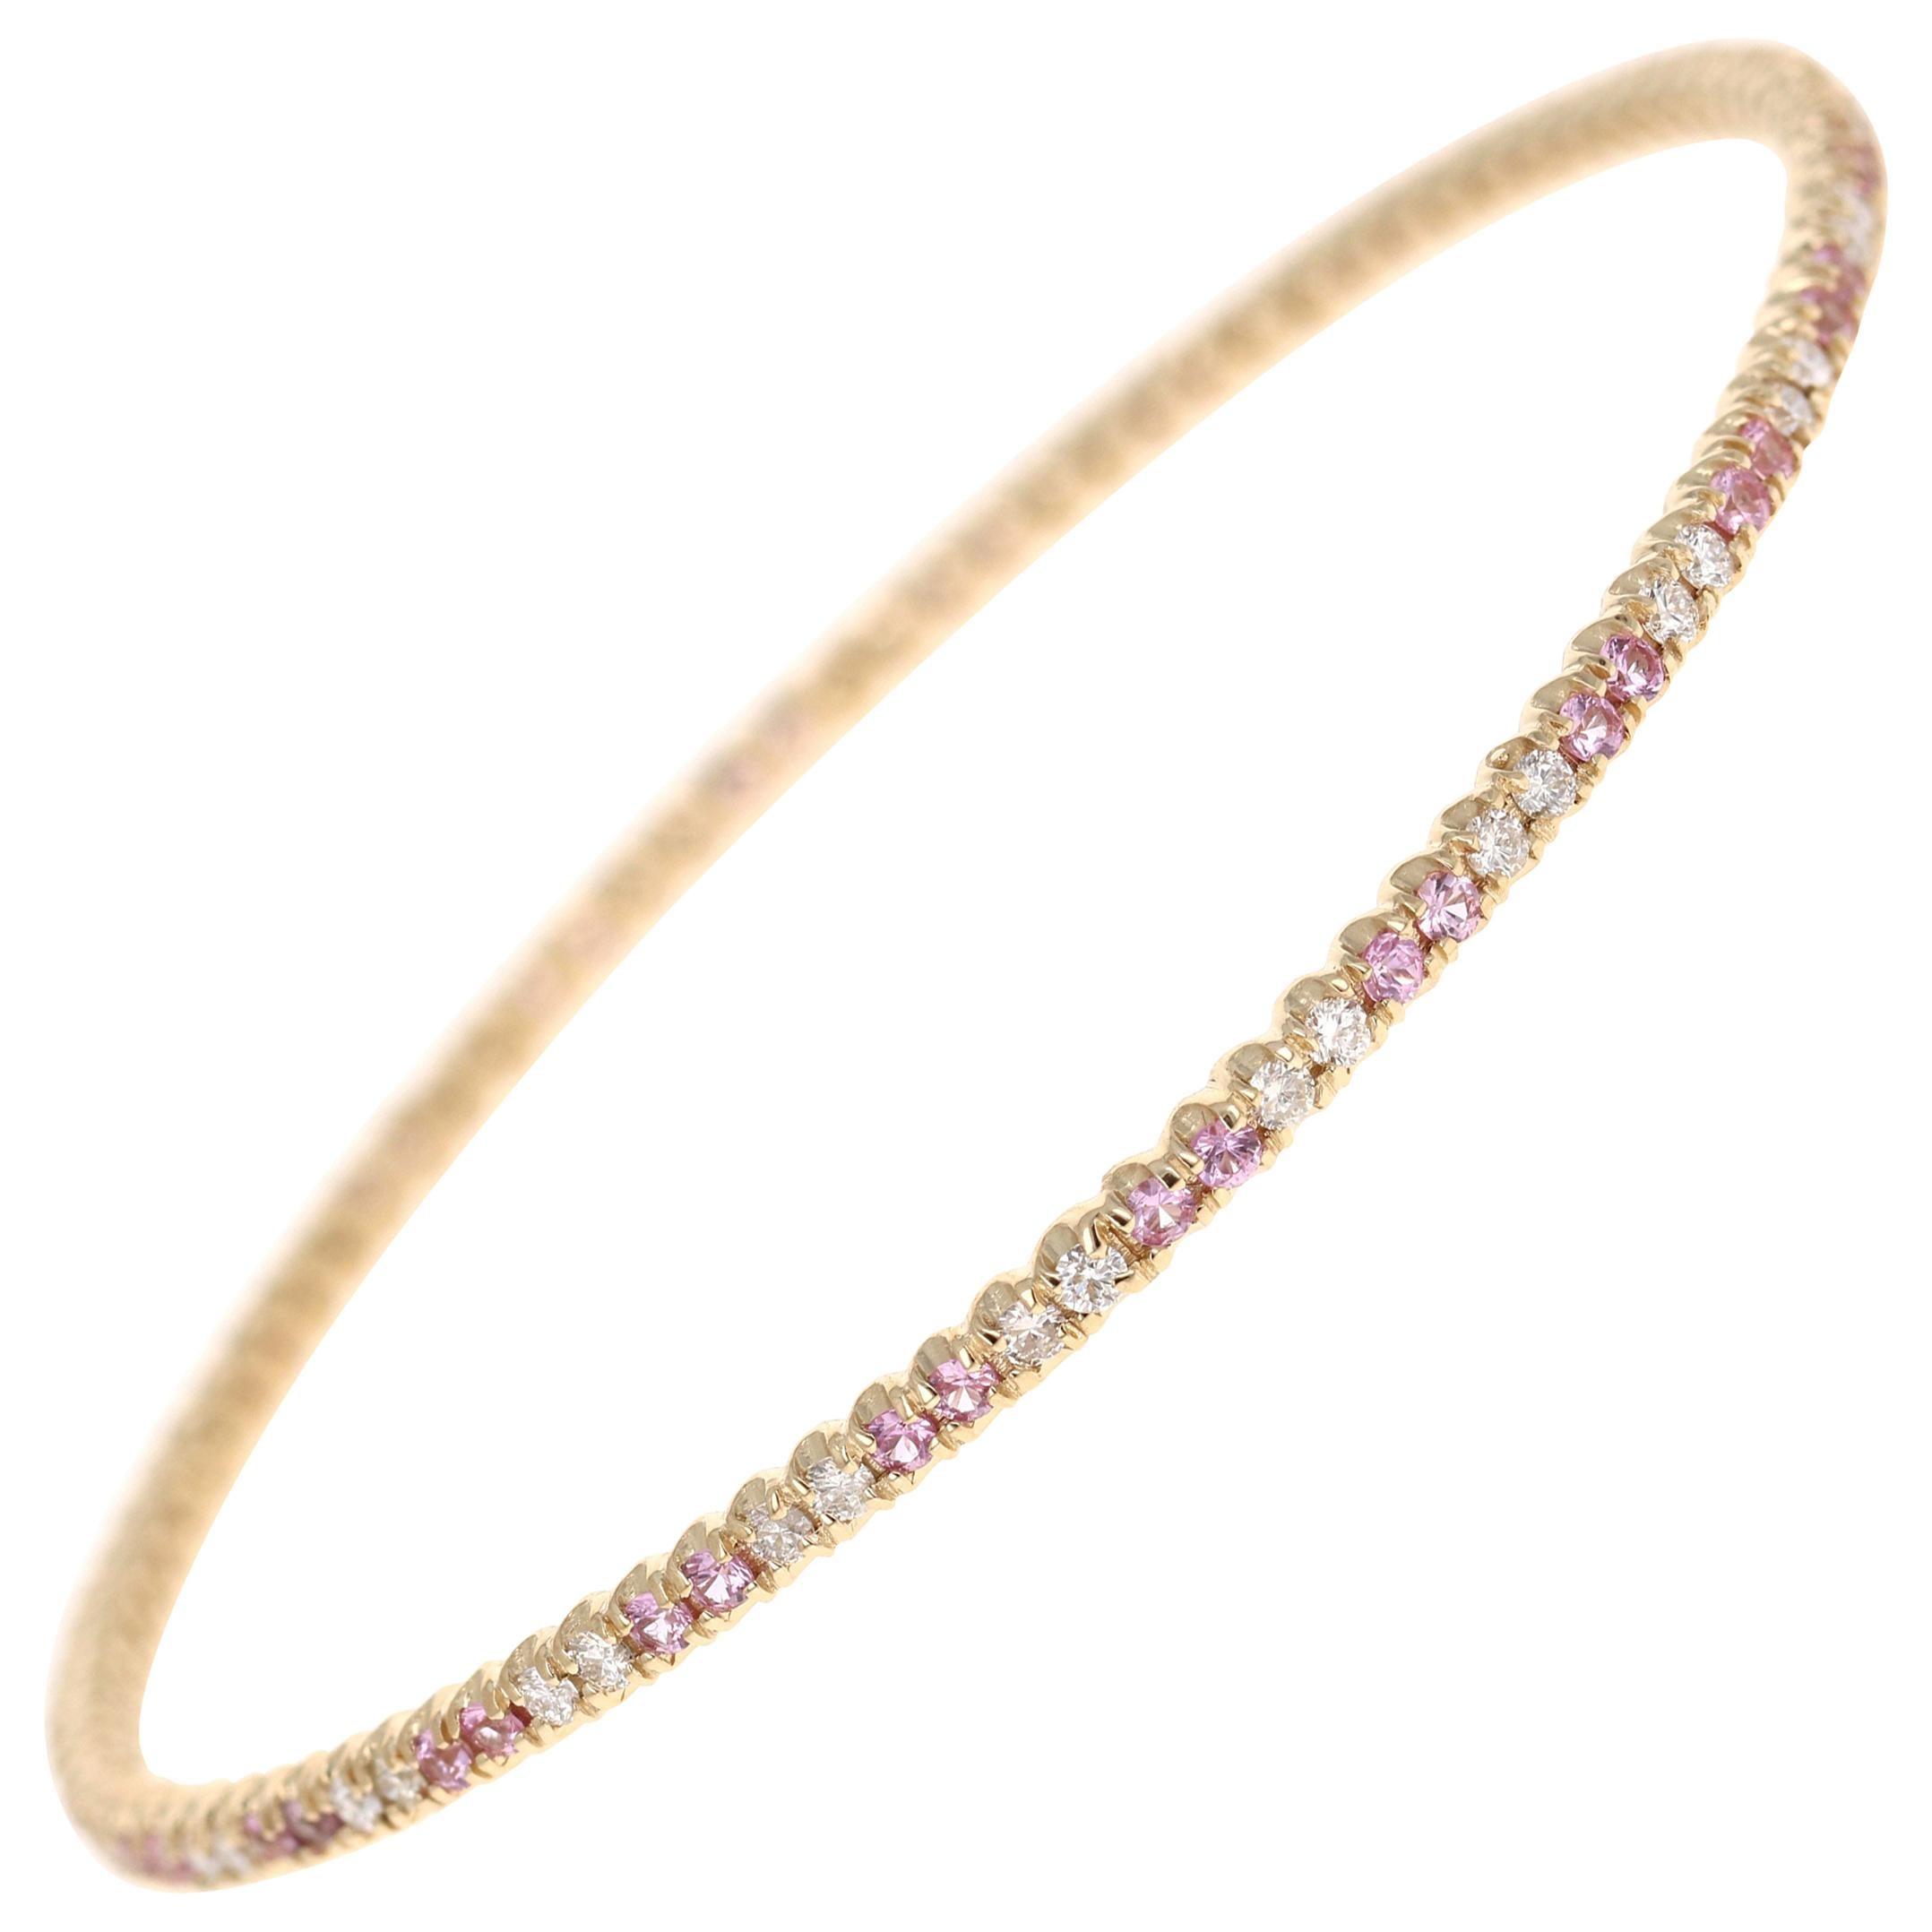 2.72 Carat Pink Sapphire Diamond 14 Karat Yellow Gold Eternity Bangle